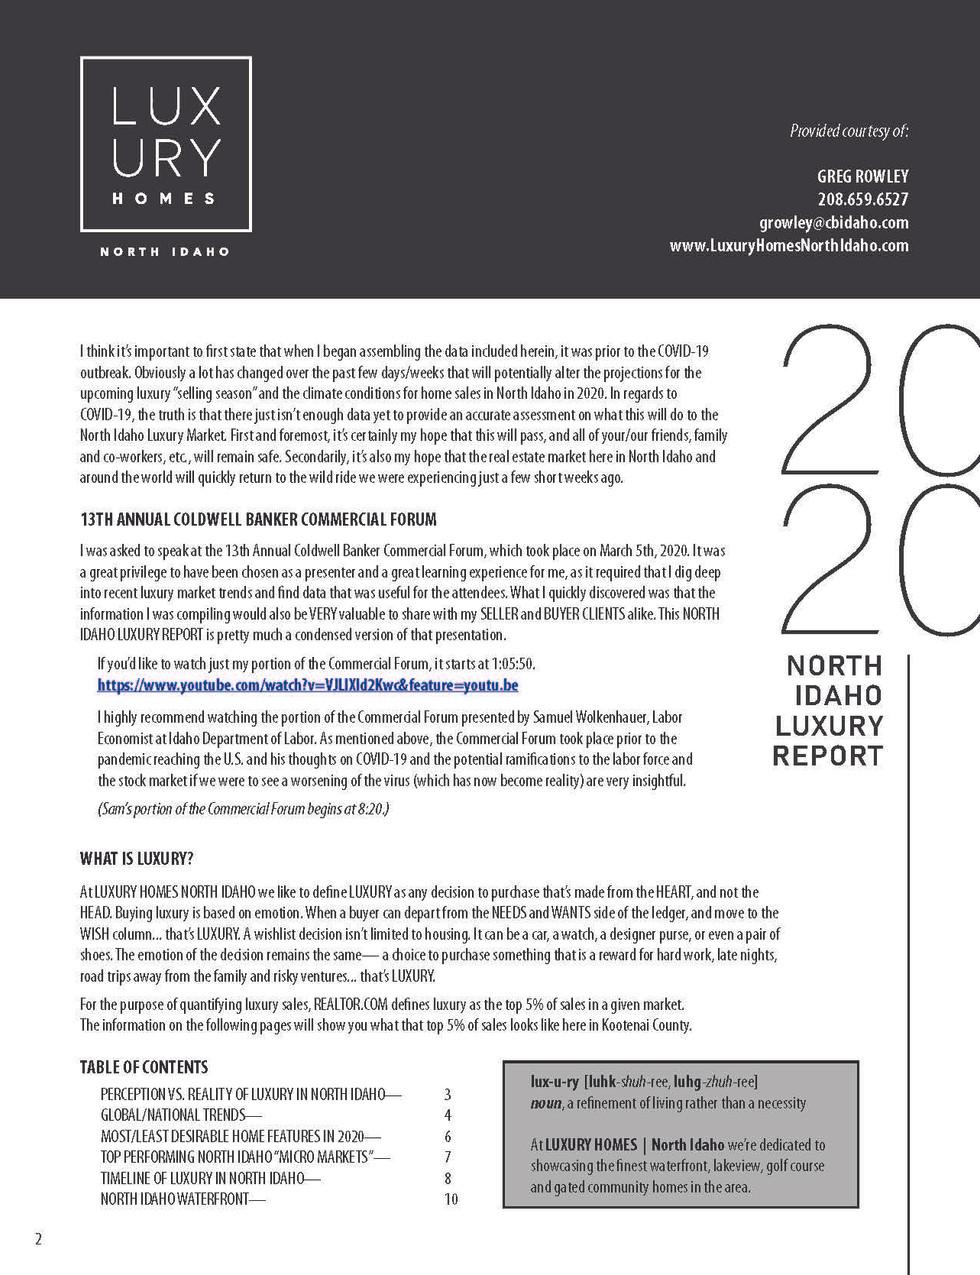 2020 LUXURY MARKET REPORT